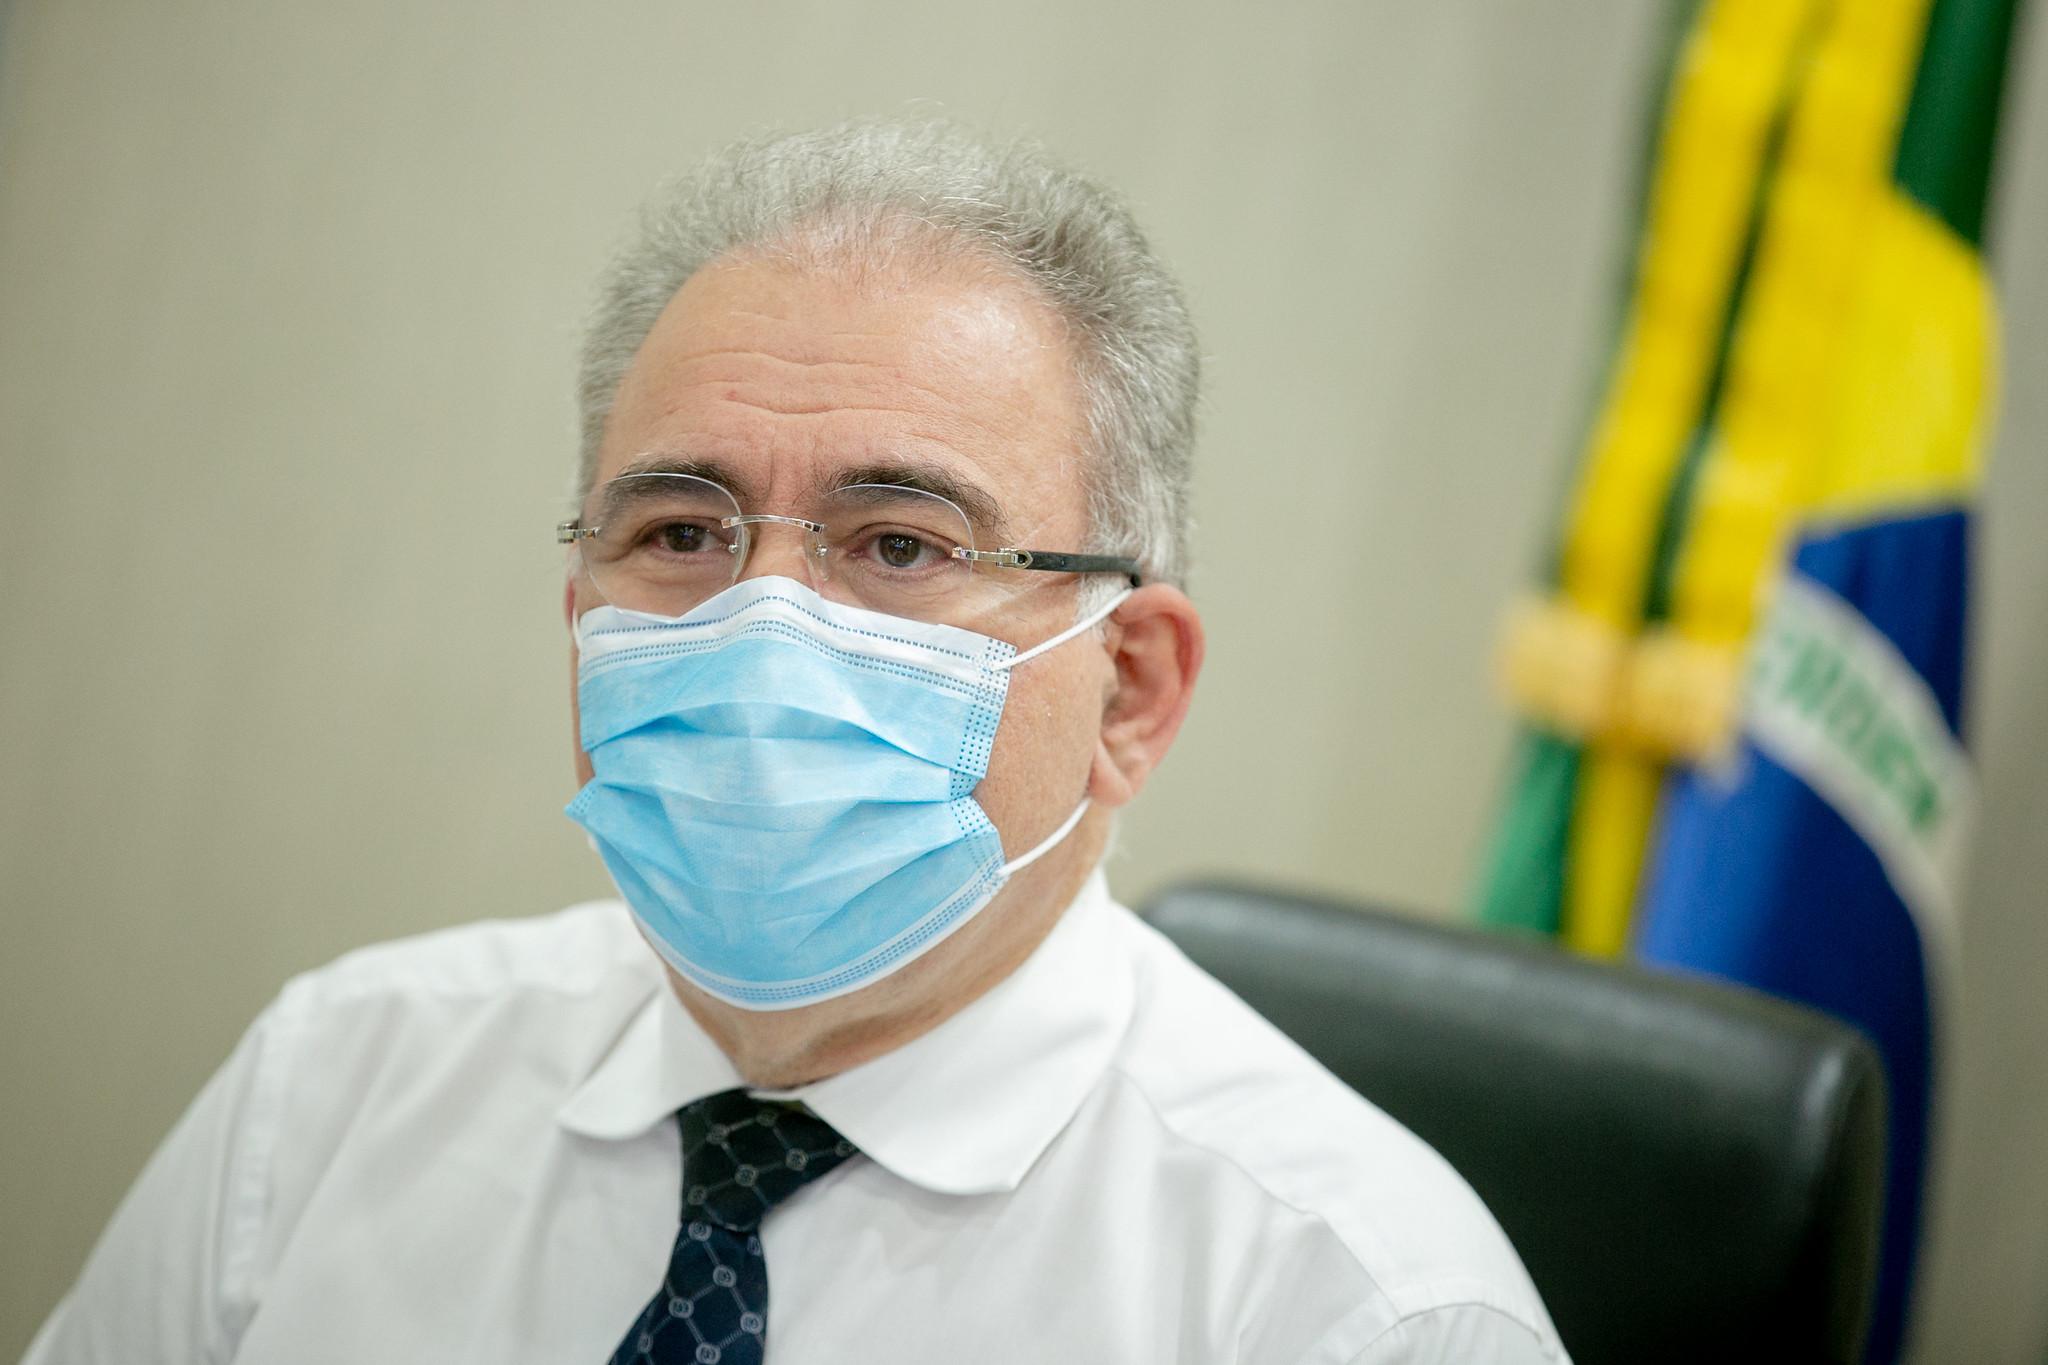 Vacina da Janssen chega na terça, diz Queiroga